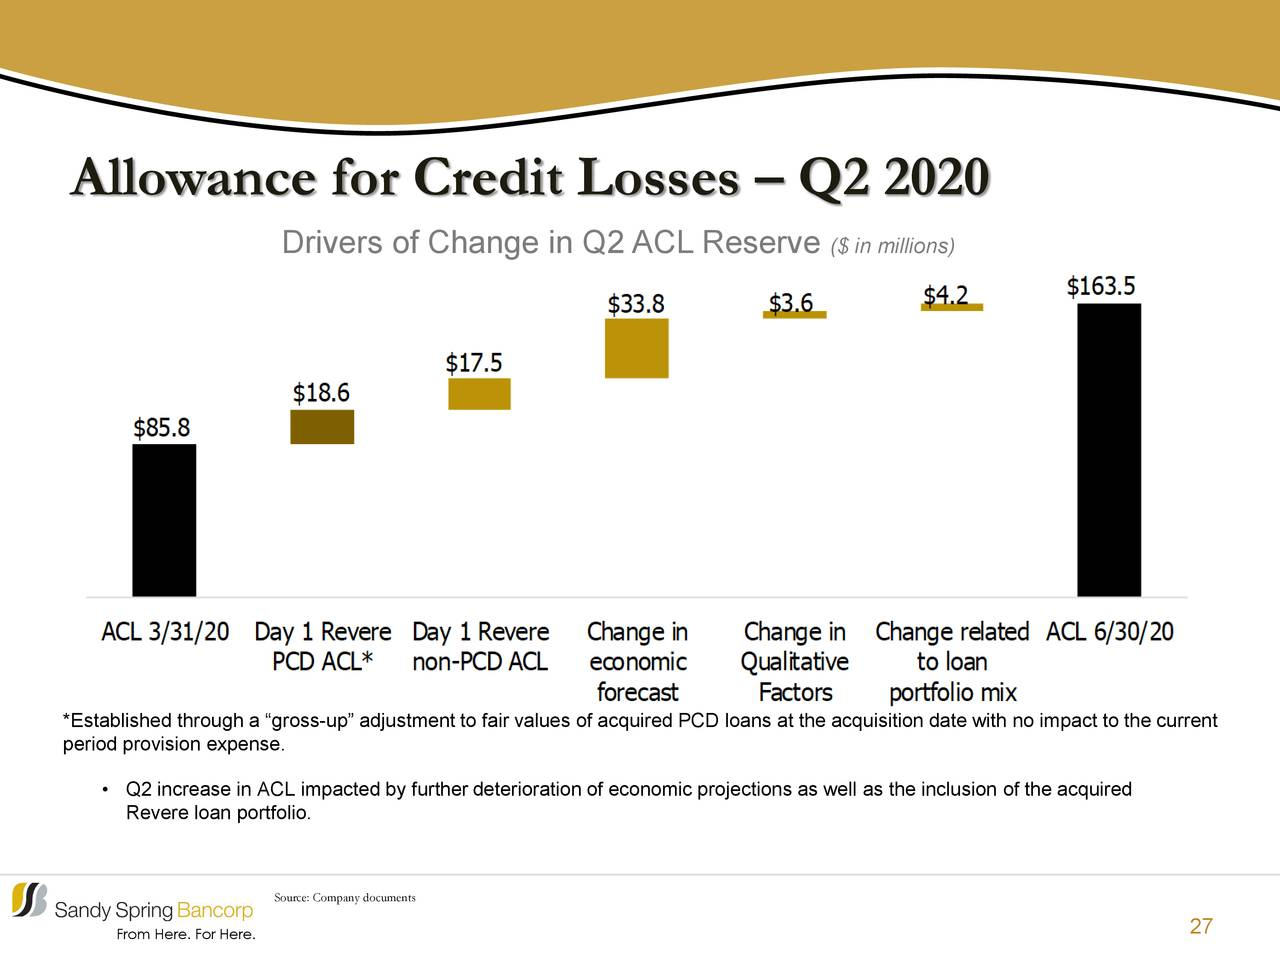 Estimación para pérdidas crediticias - segundo trimestre de 2020